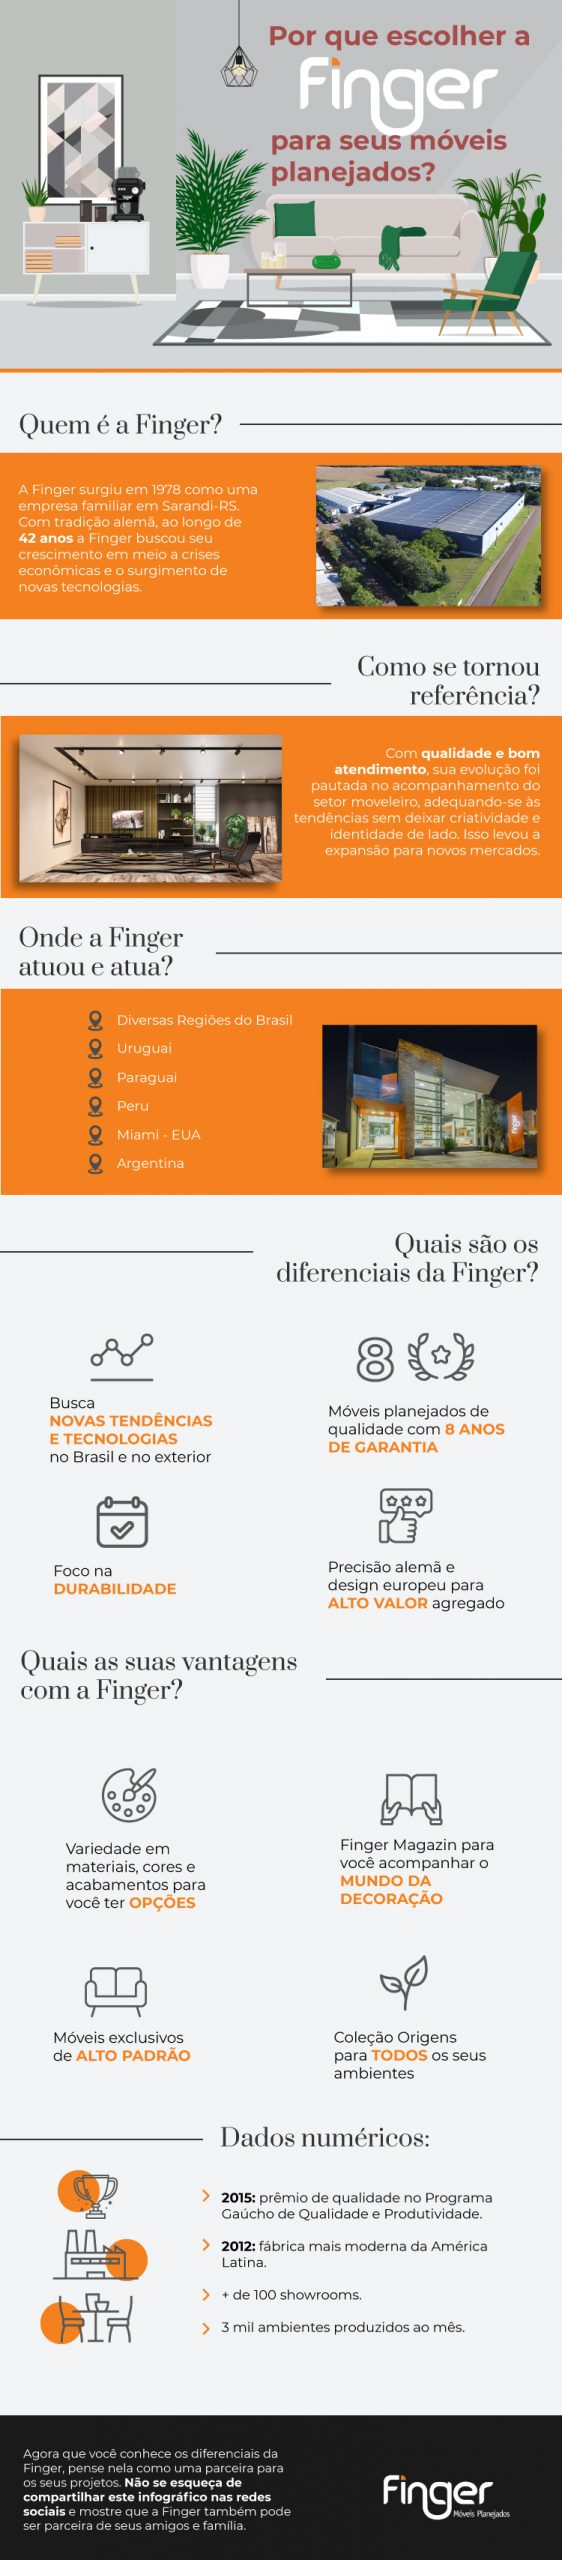 infografico_diferenciais_finger